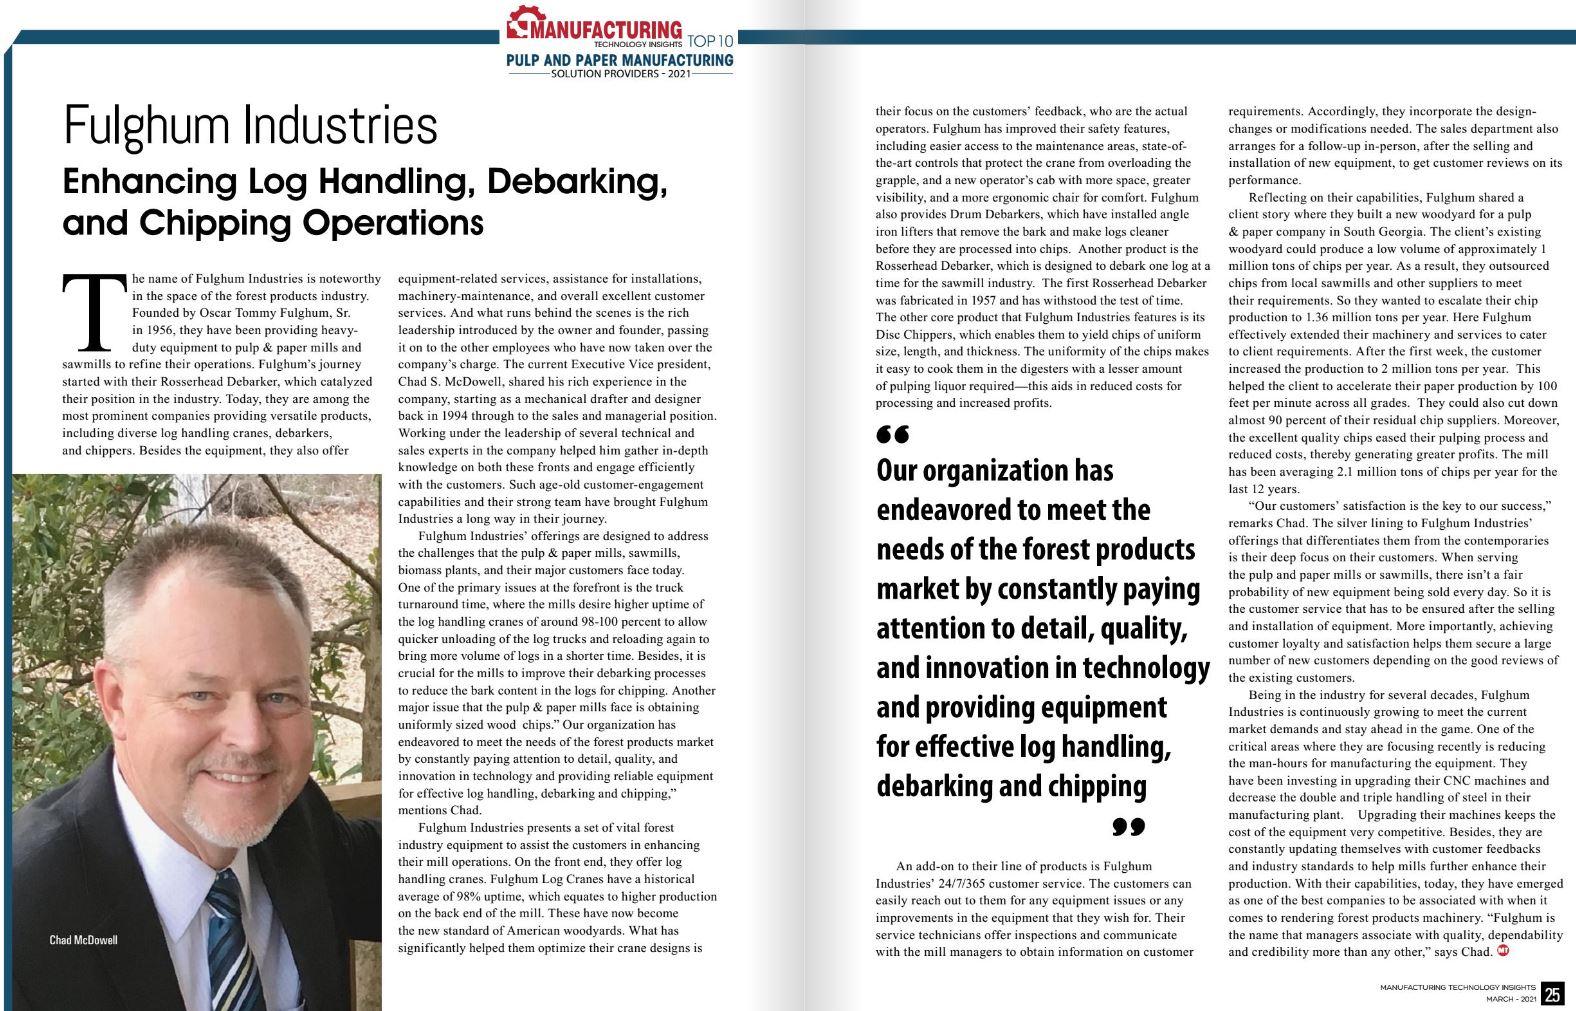 Enhancing Log Handling, Debarking, and Chipping Operations